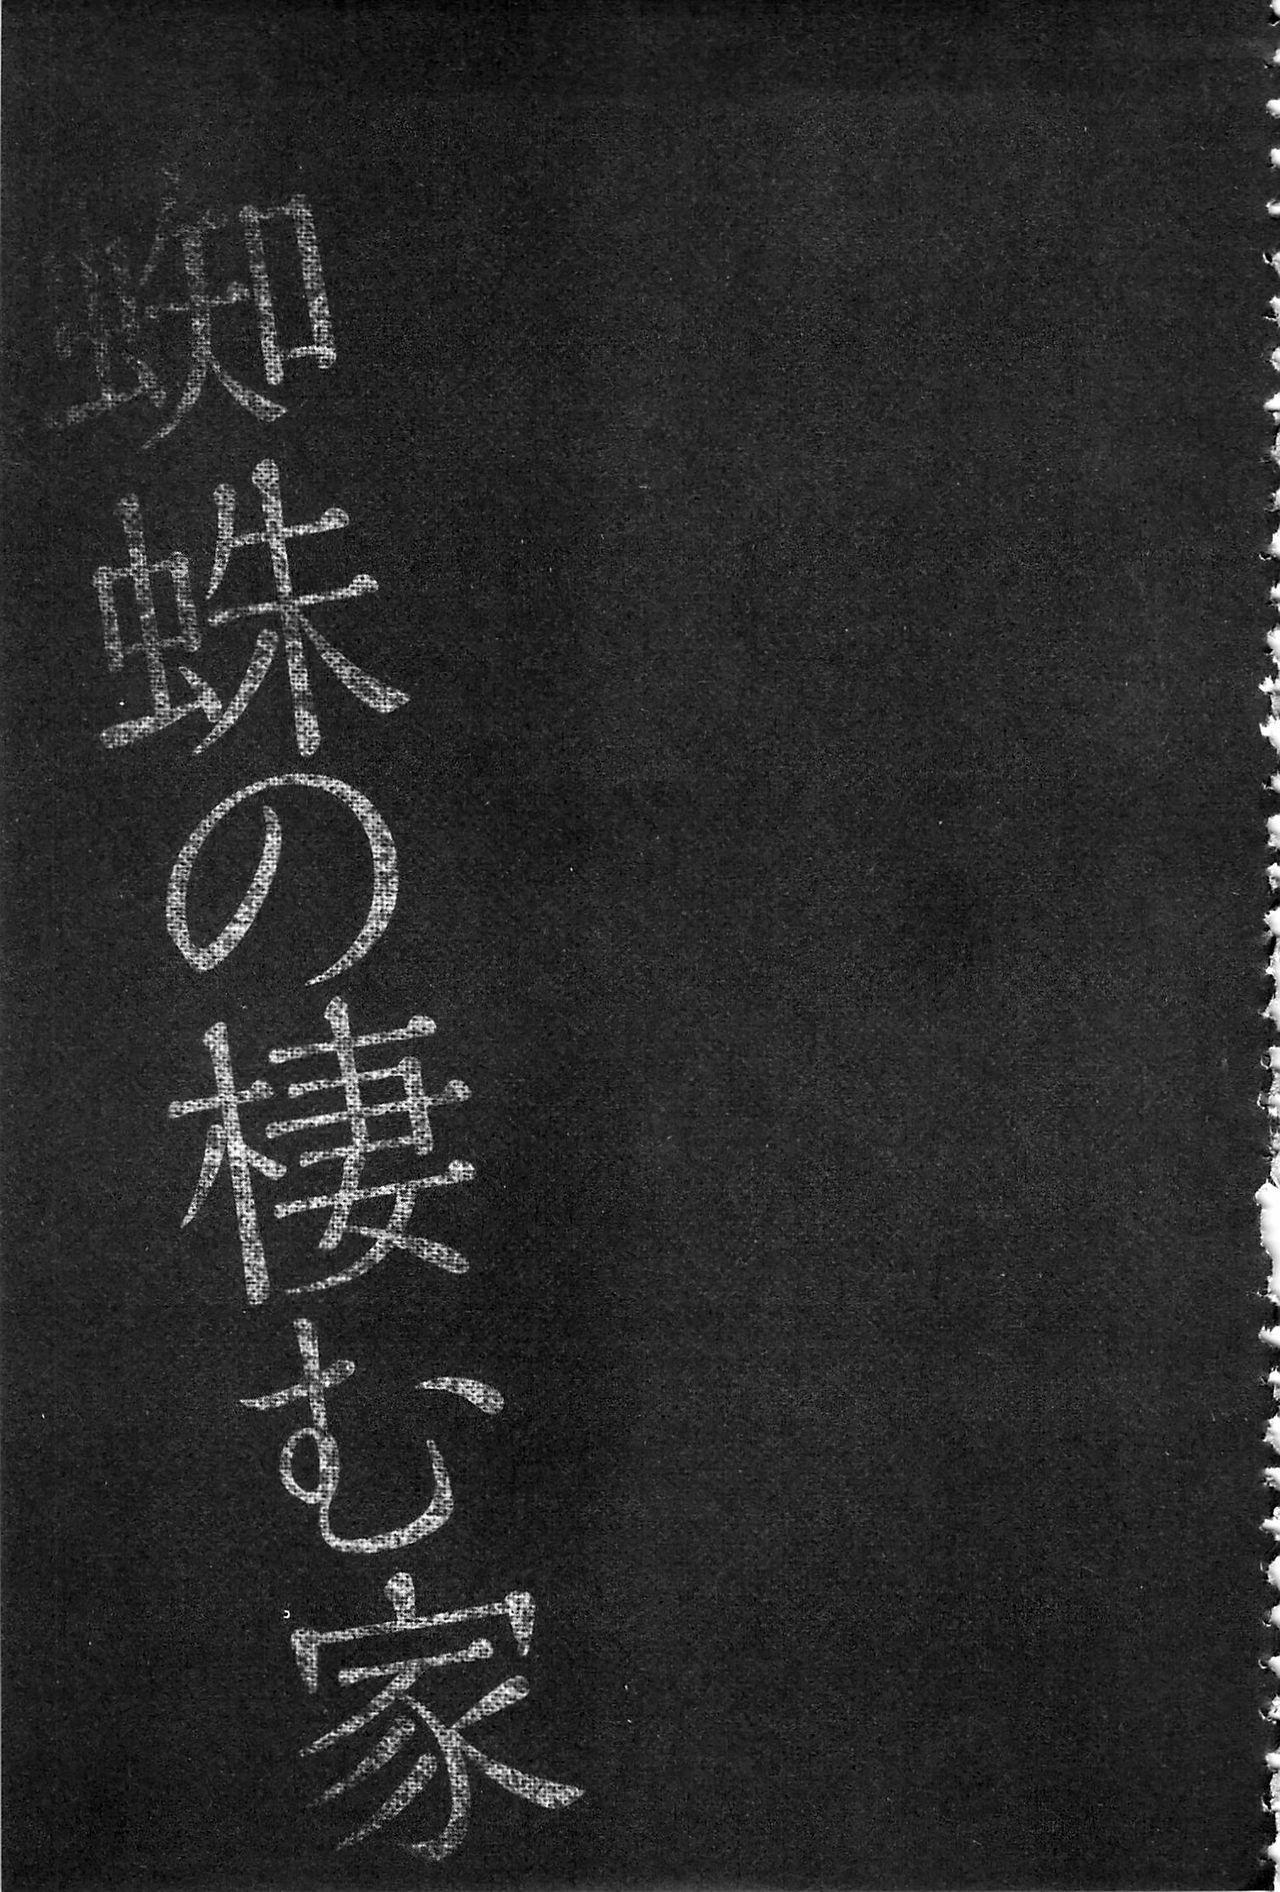 [Amano Kazumi] Seida Inyou -Seijo no Katachi Shita Intou- | 聖墮陰陽 -聖女的容貌與淫蕩- [Chinese] 160